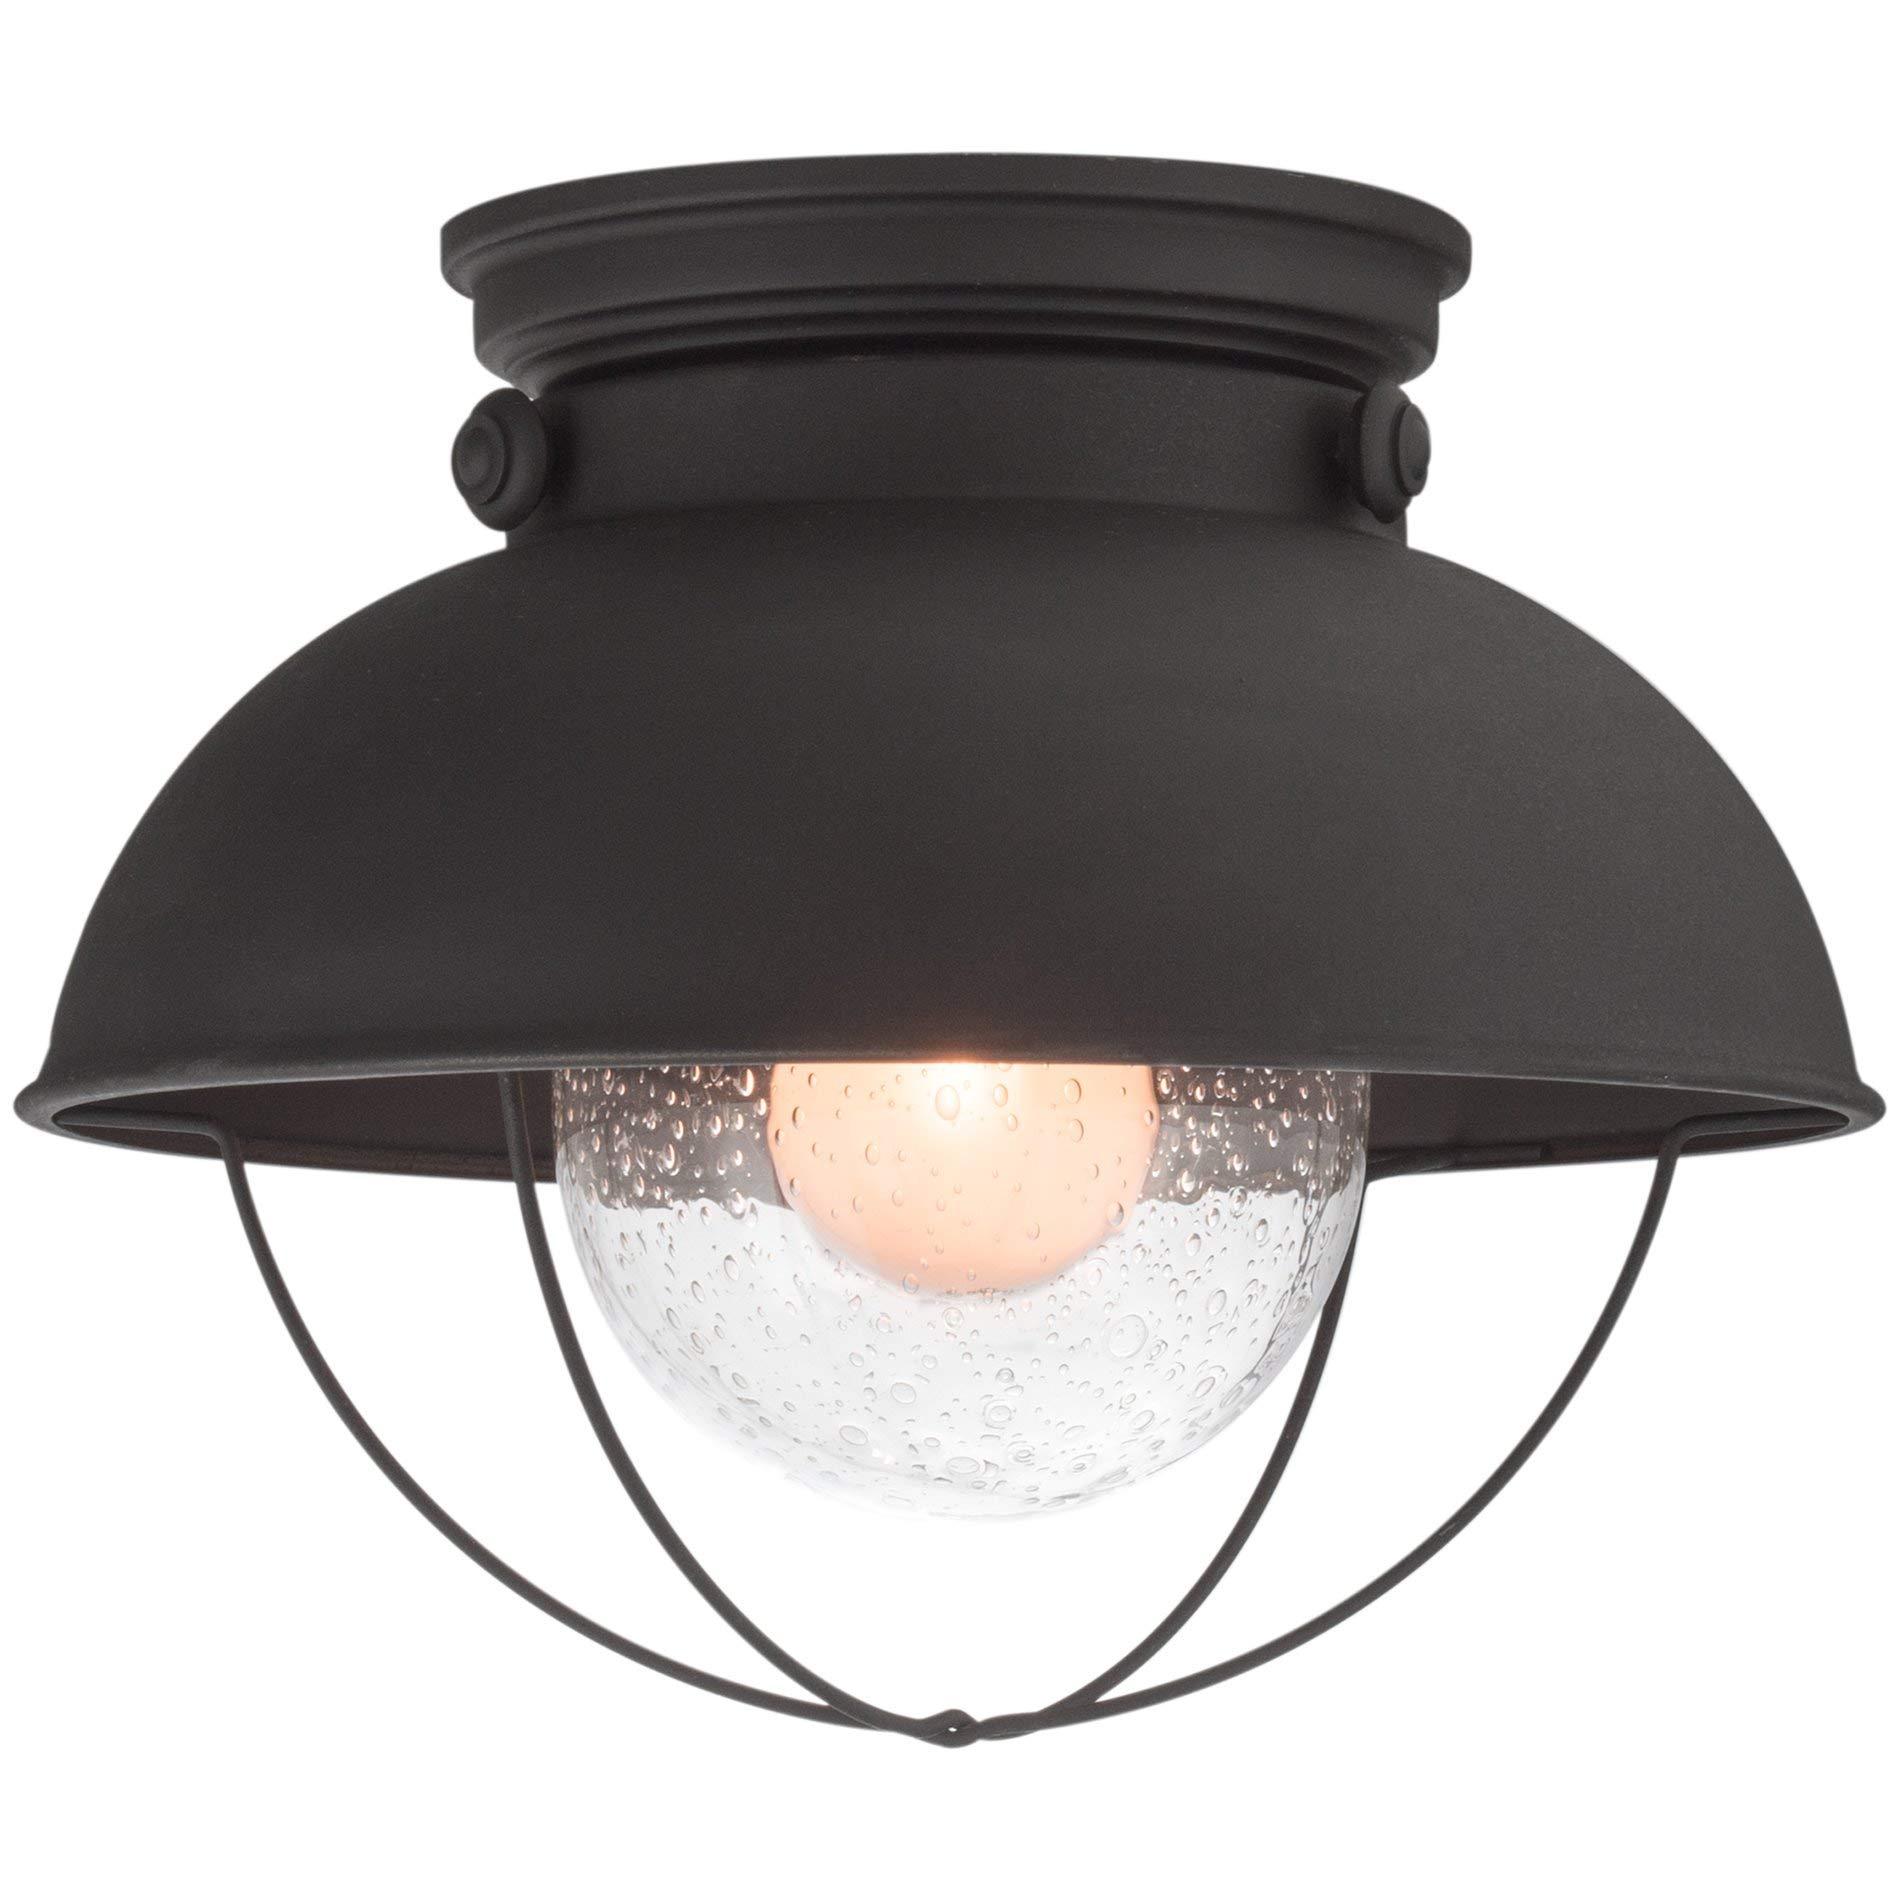 Kira Home Bayside 11'' Industrial Farmhouse Flush Mount Ceiling Light + Seeded Glass Shade, Matte Black Finish